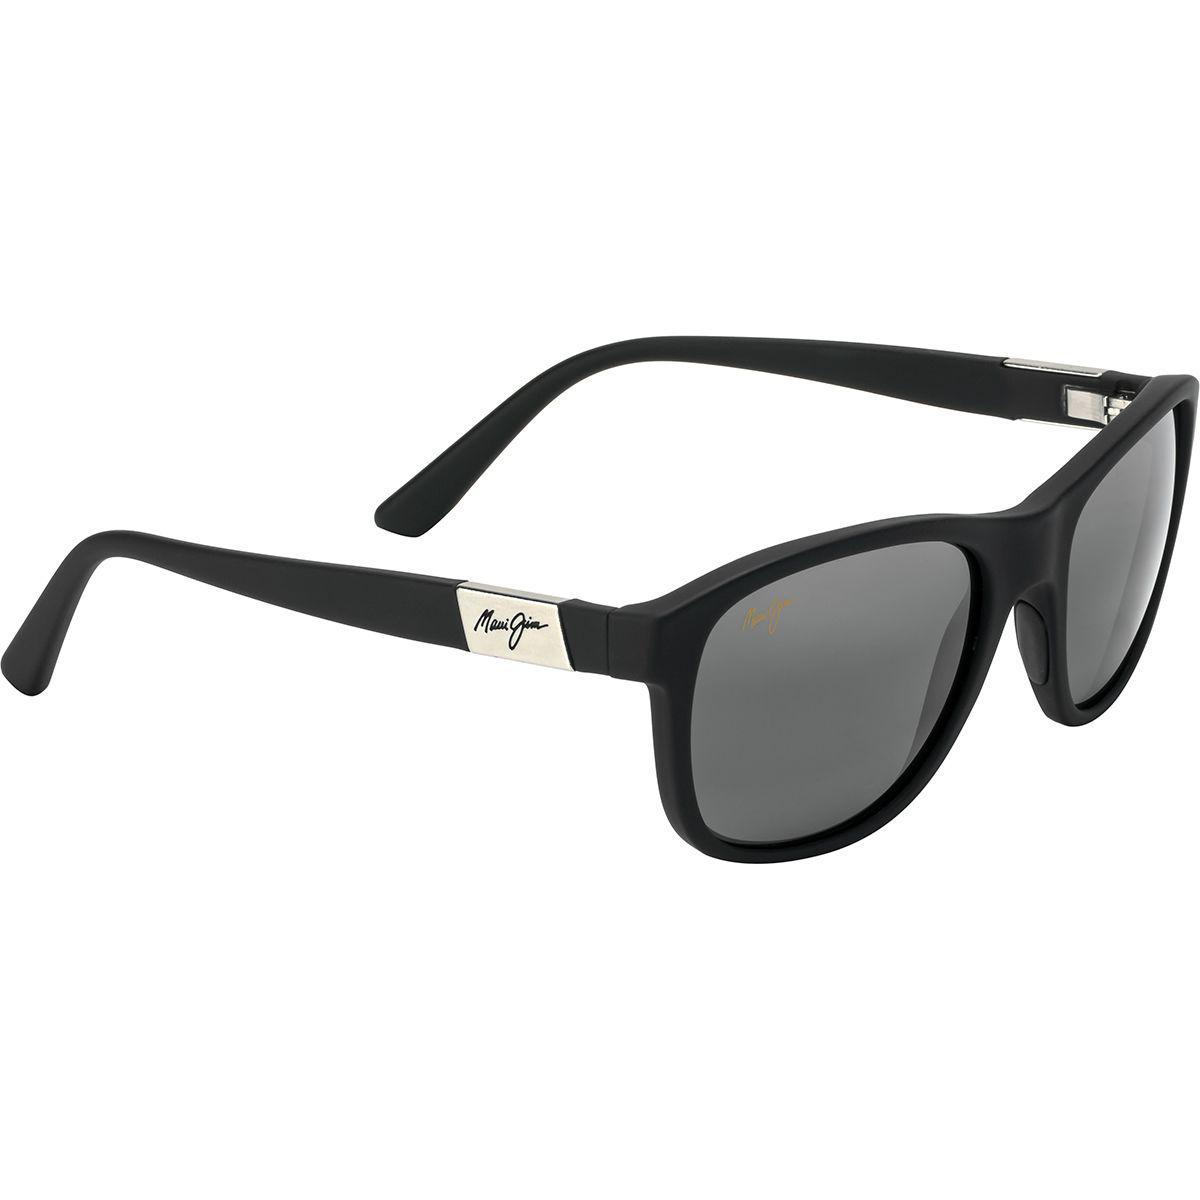 a25a689b70 Lyst - Maui Jim Wakea Sunglasses - Polarized in Black for Men